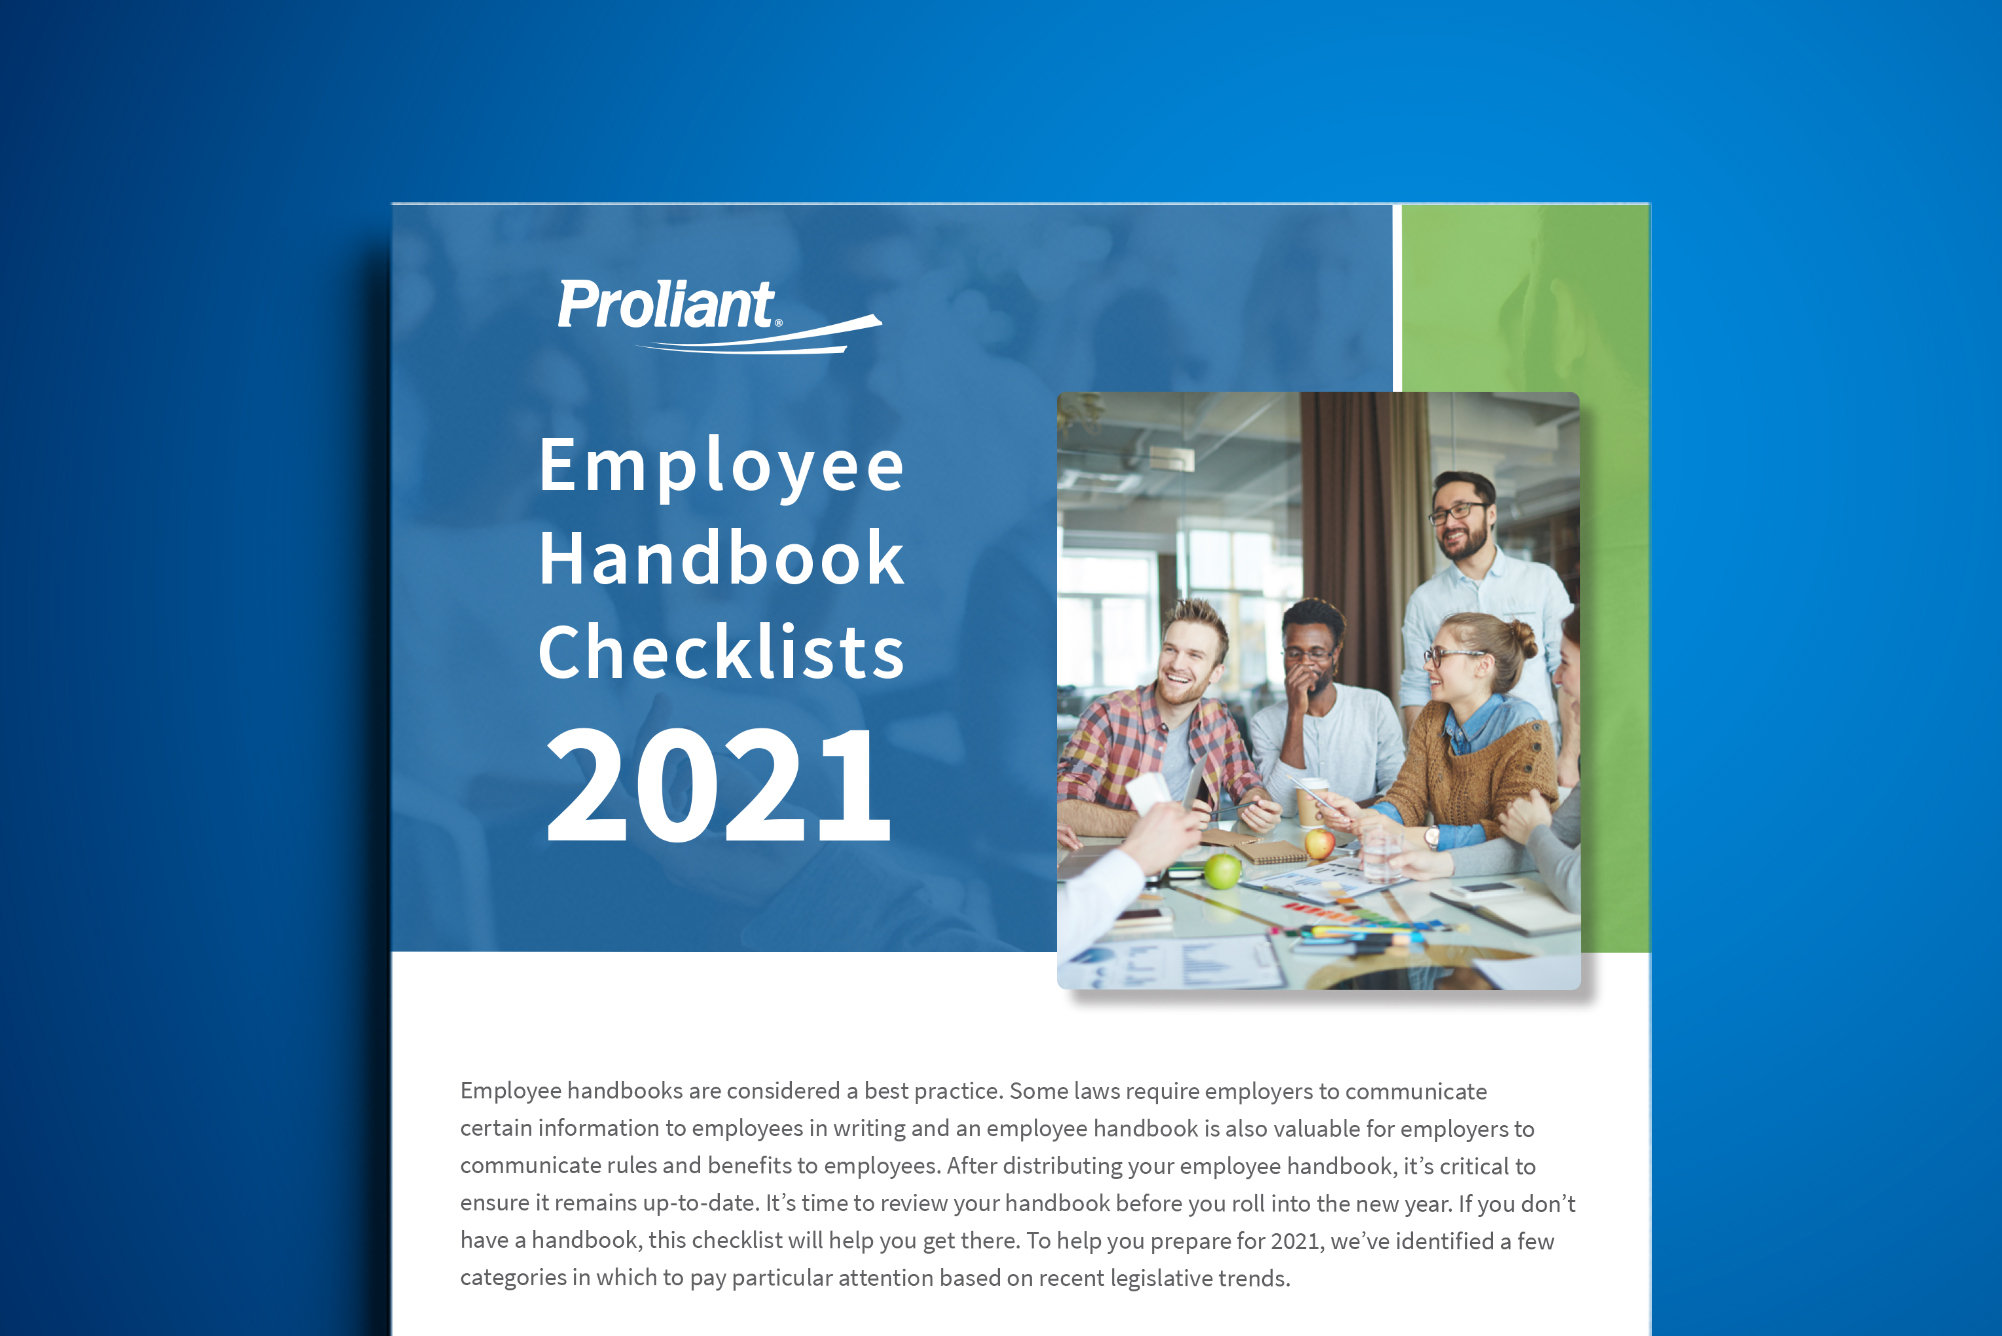 employee-handbook-checklist-2021-mockup